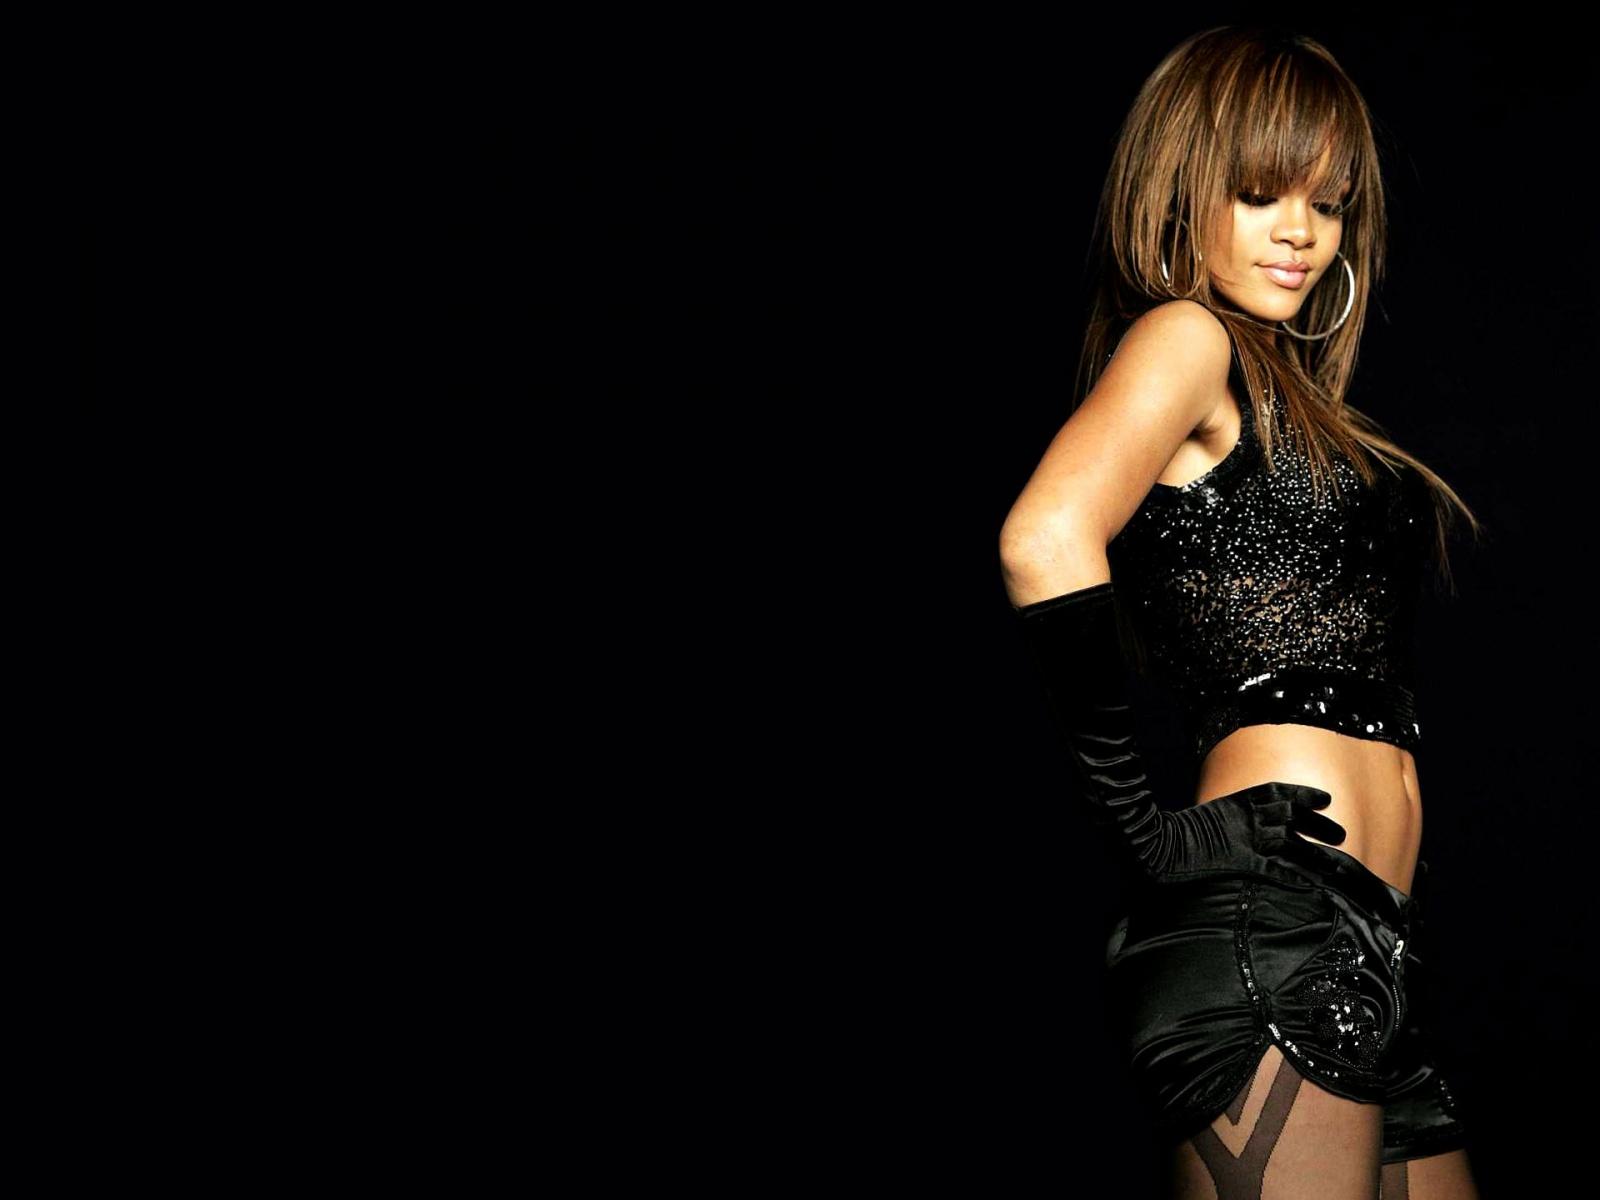 http://1.bp.blogspot.com/-9yZDSpZfW8Q/T7VQJ1vGU7I/AAAAAAAAA0c/4116hsATrAE/s1600/Rihanna+Sexy+Wallpapers+02.jpg